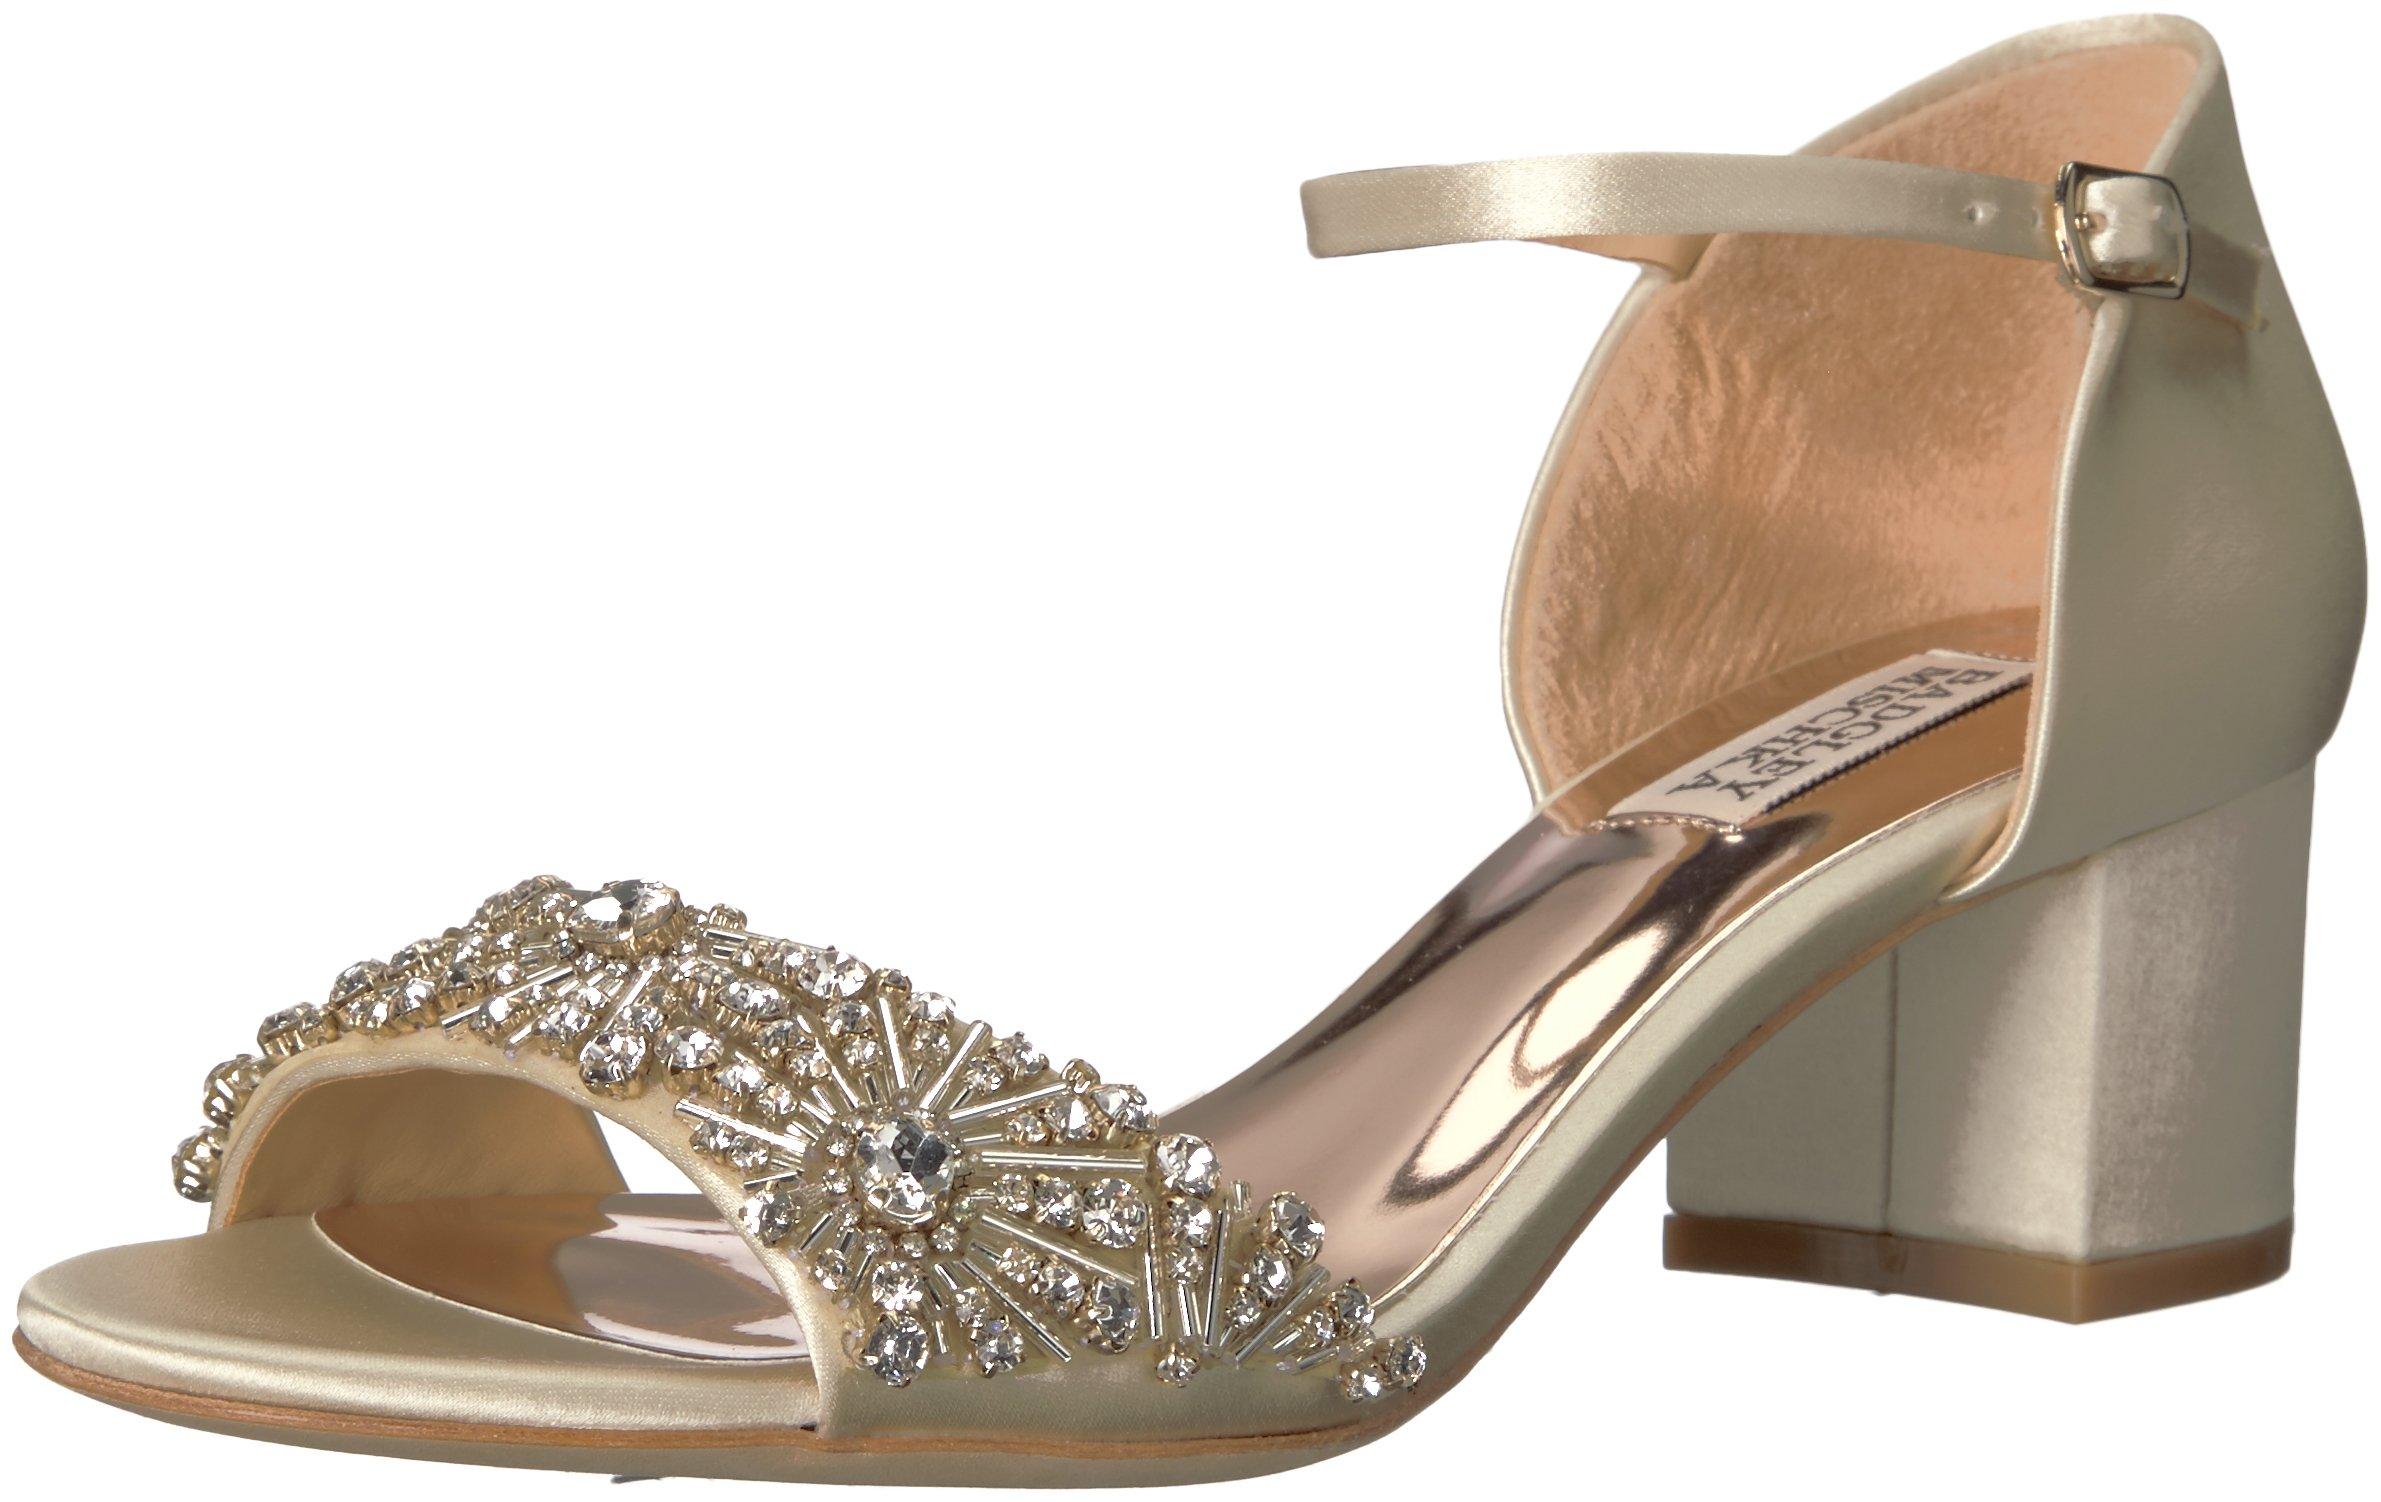 Badgley Mischka Women's Mareva Heeled Sandal, Ivory, 8.5 M US